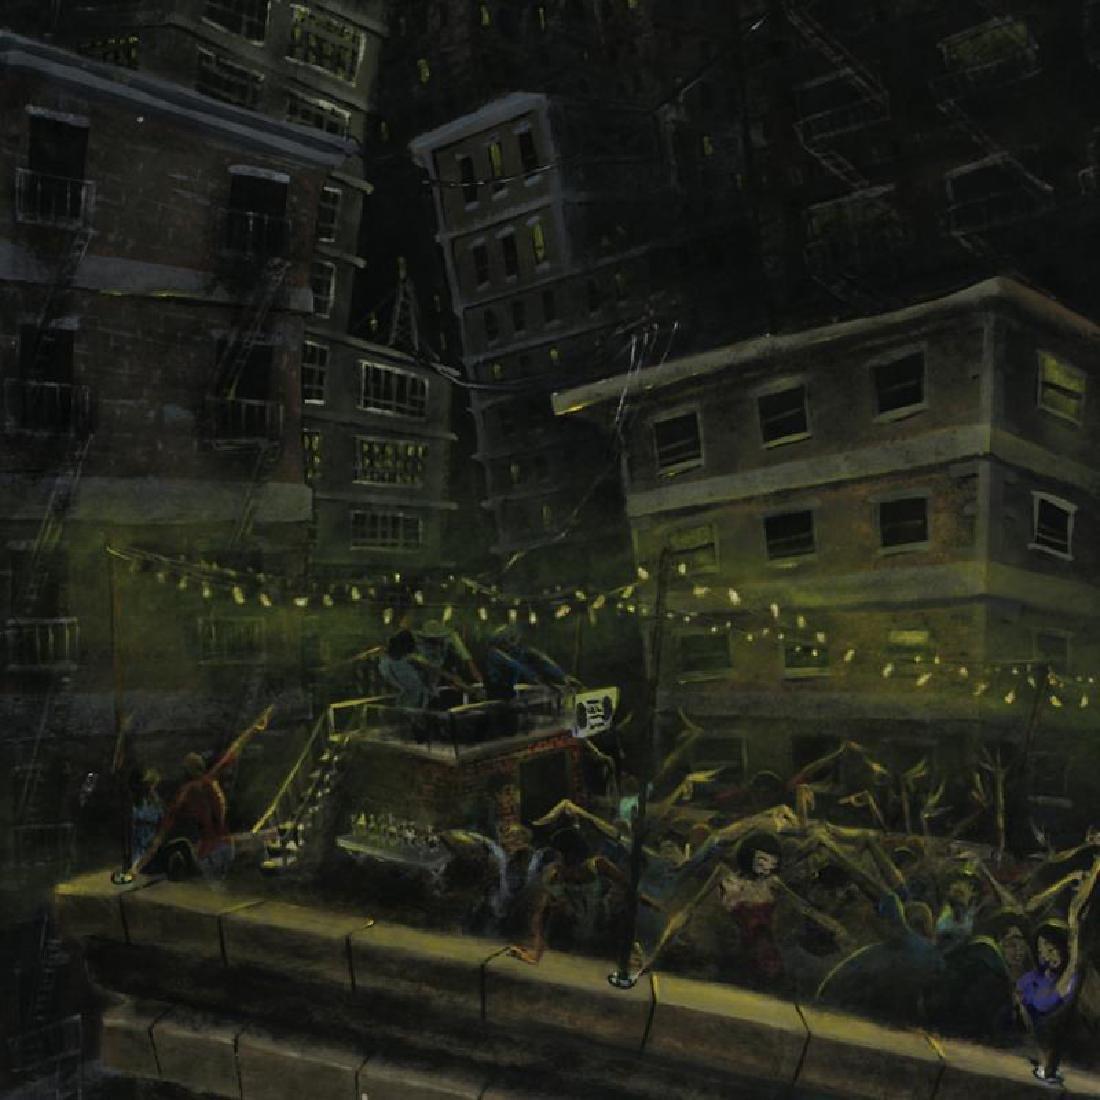 Roof Party by Garibaldi, David - 2